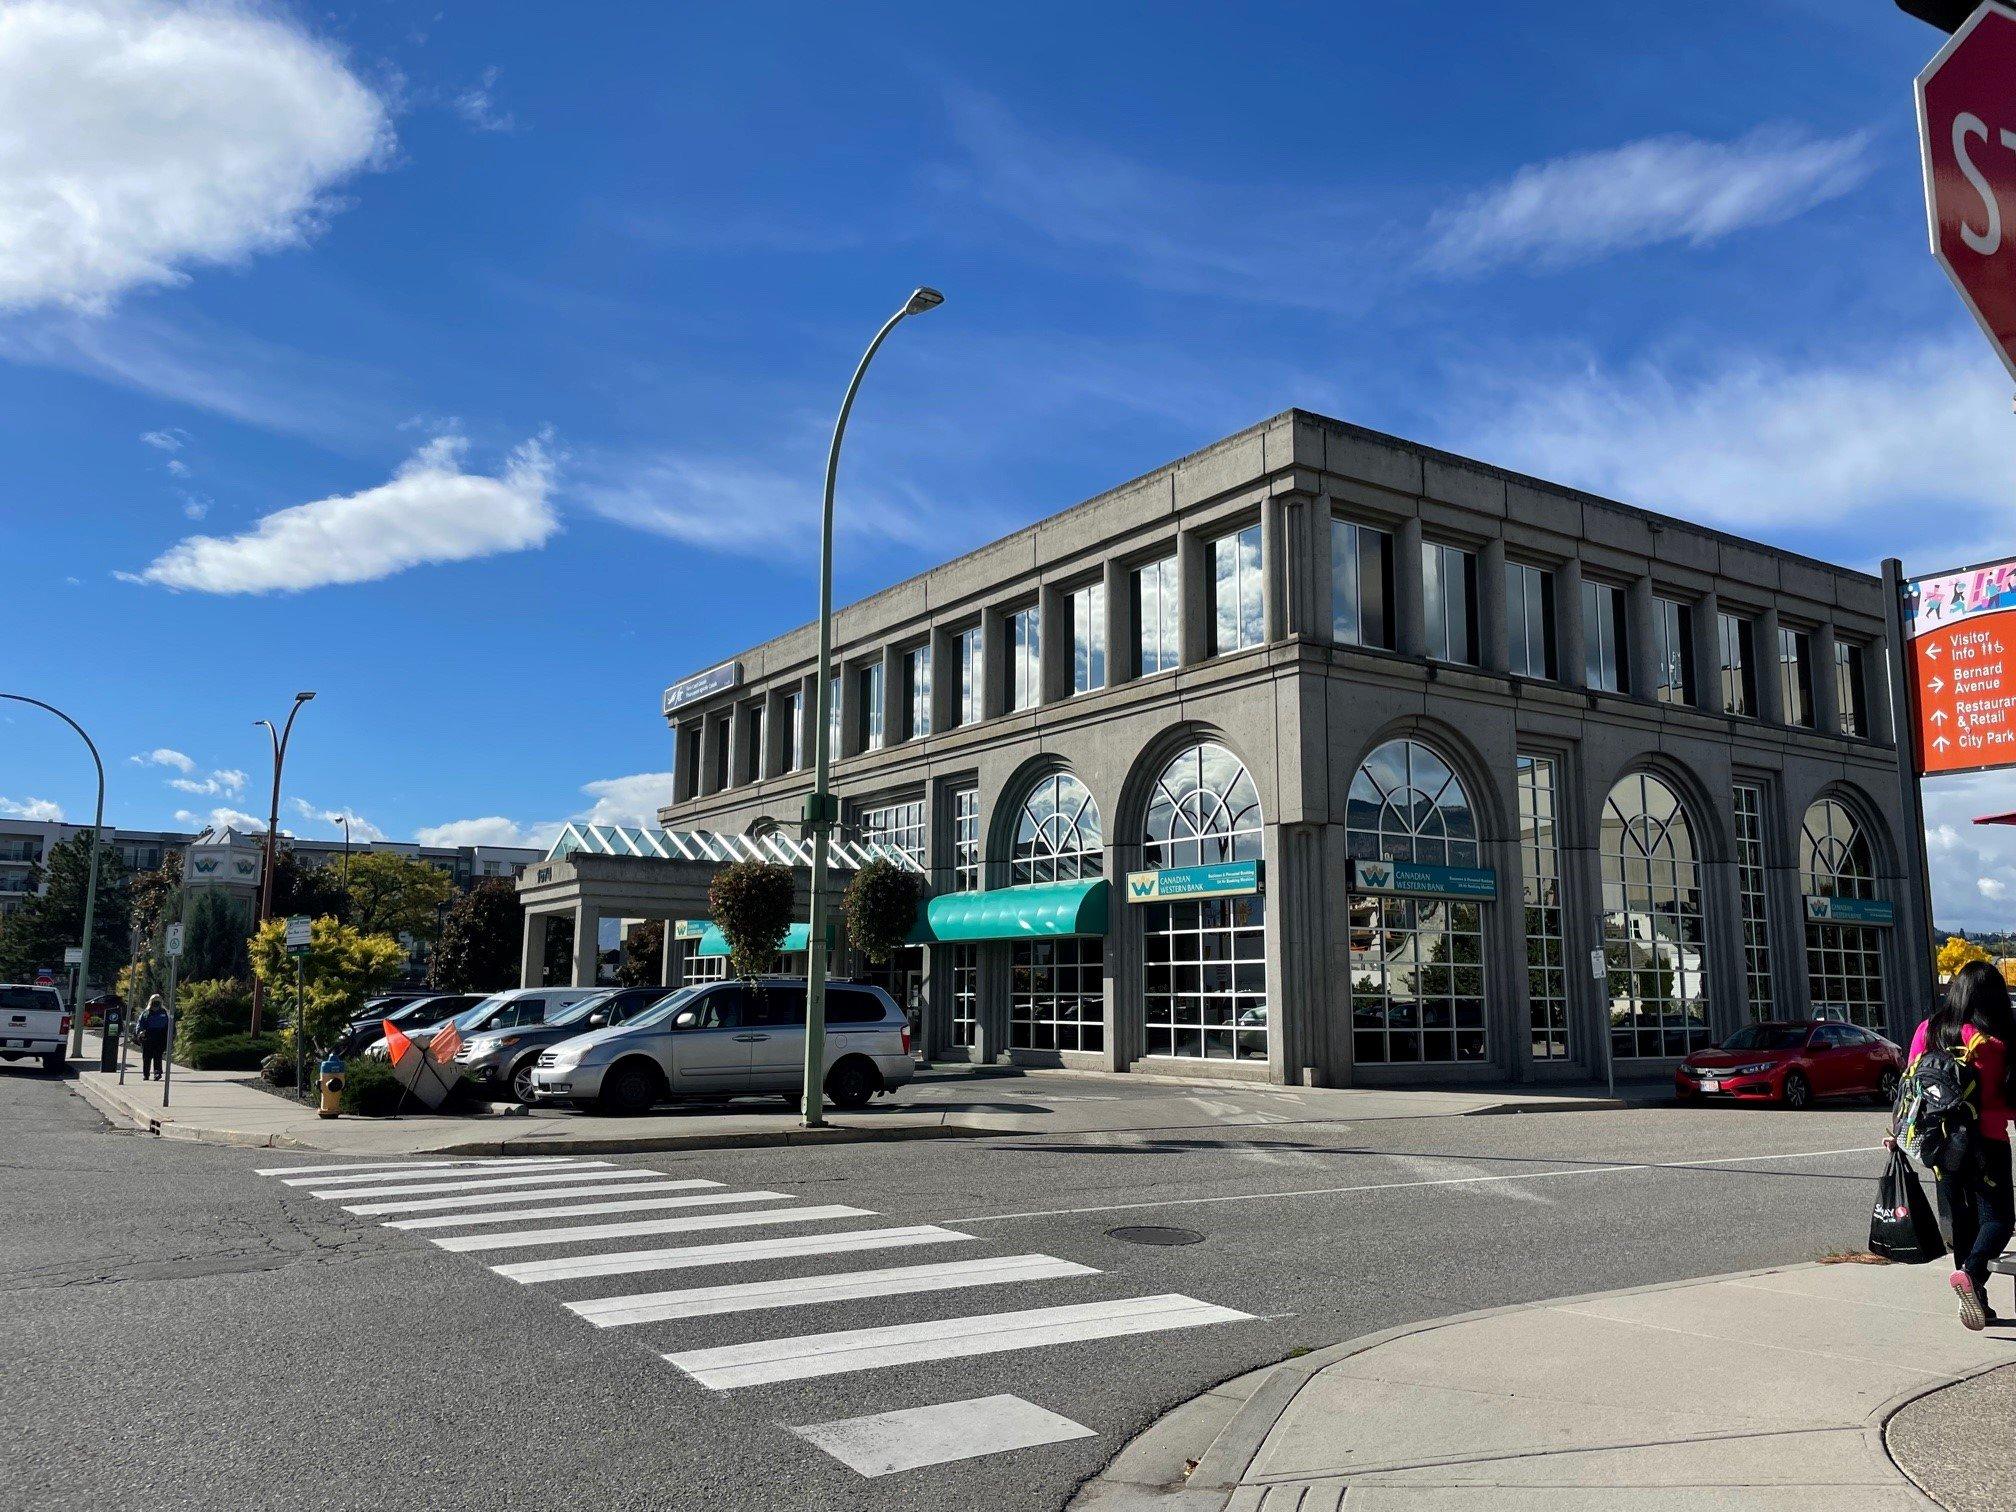 #201-1674 Bertram Street, Kelowna, BC - Downtown Kelowna Professional Space